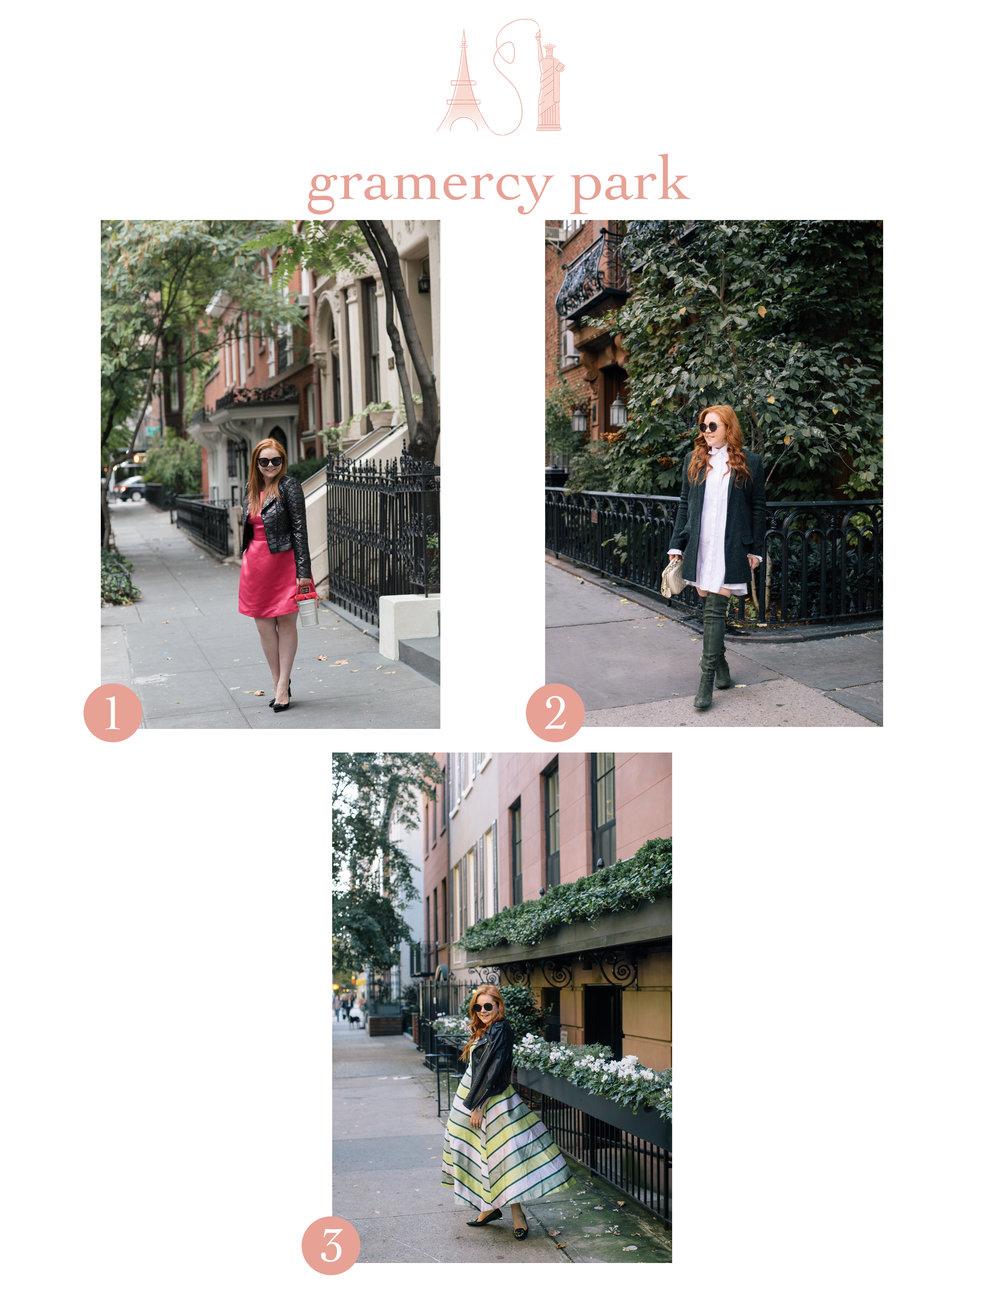 gramercy_park_photo_locations.jpg